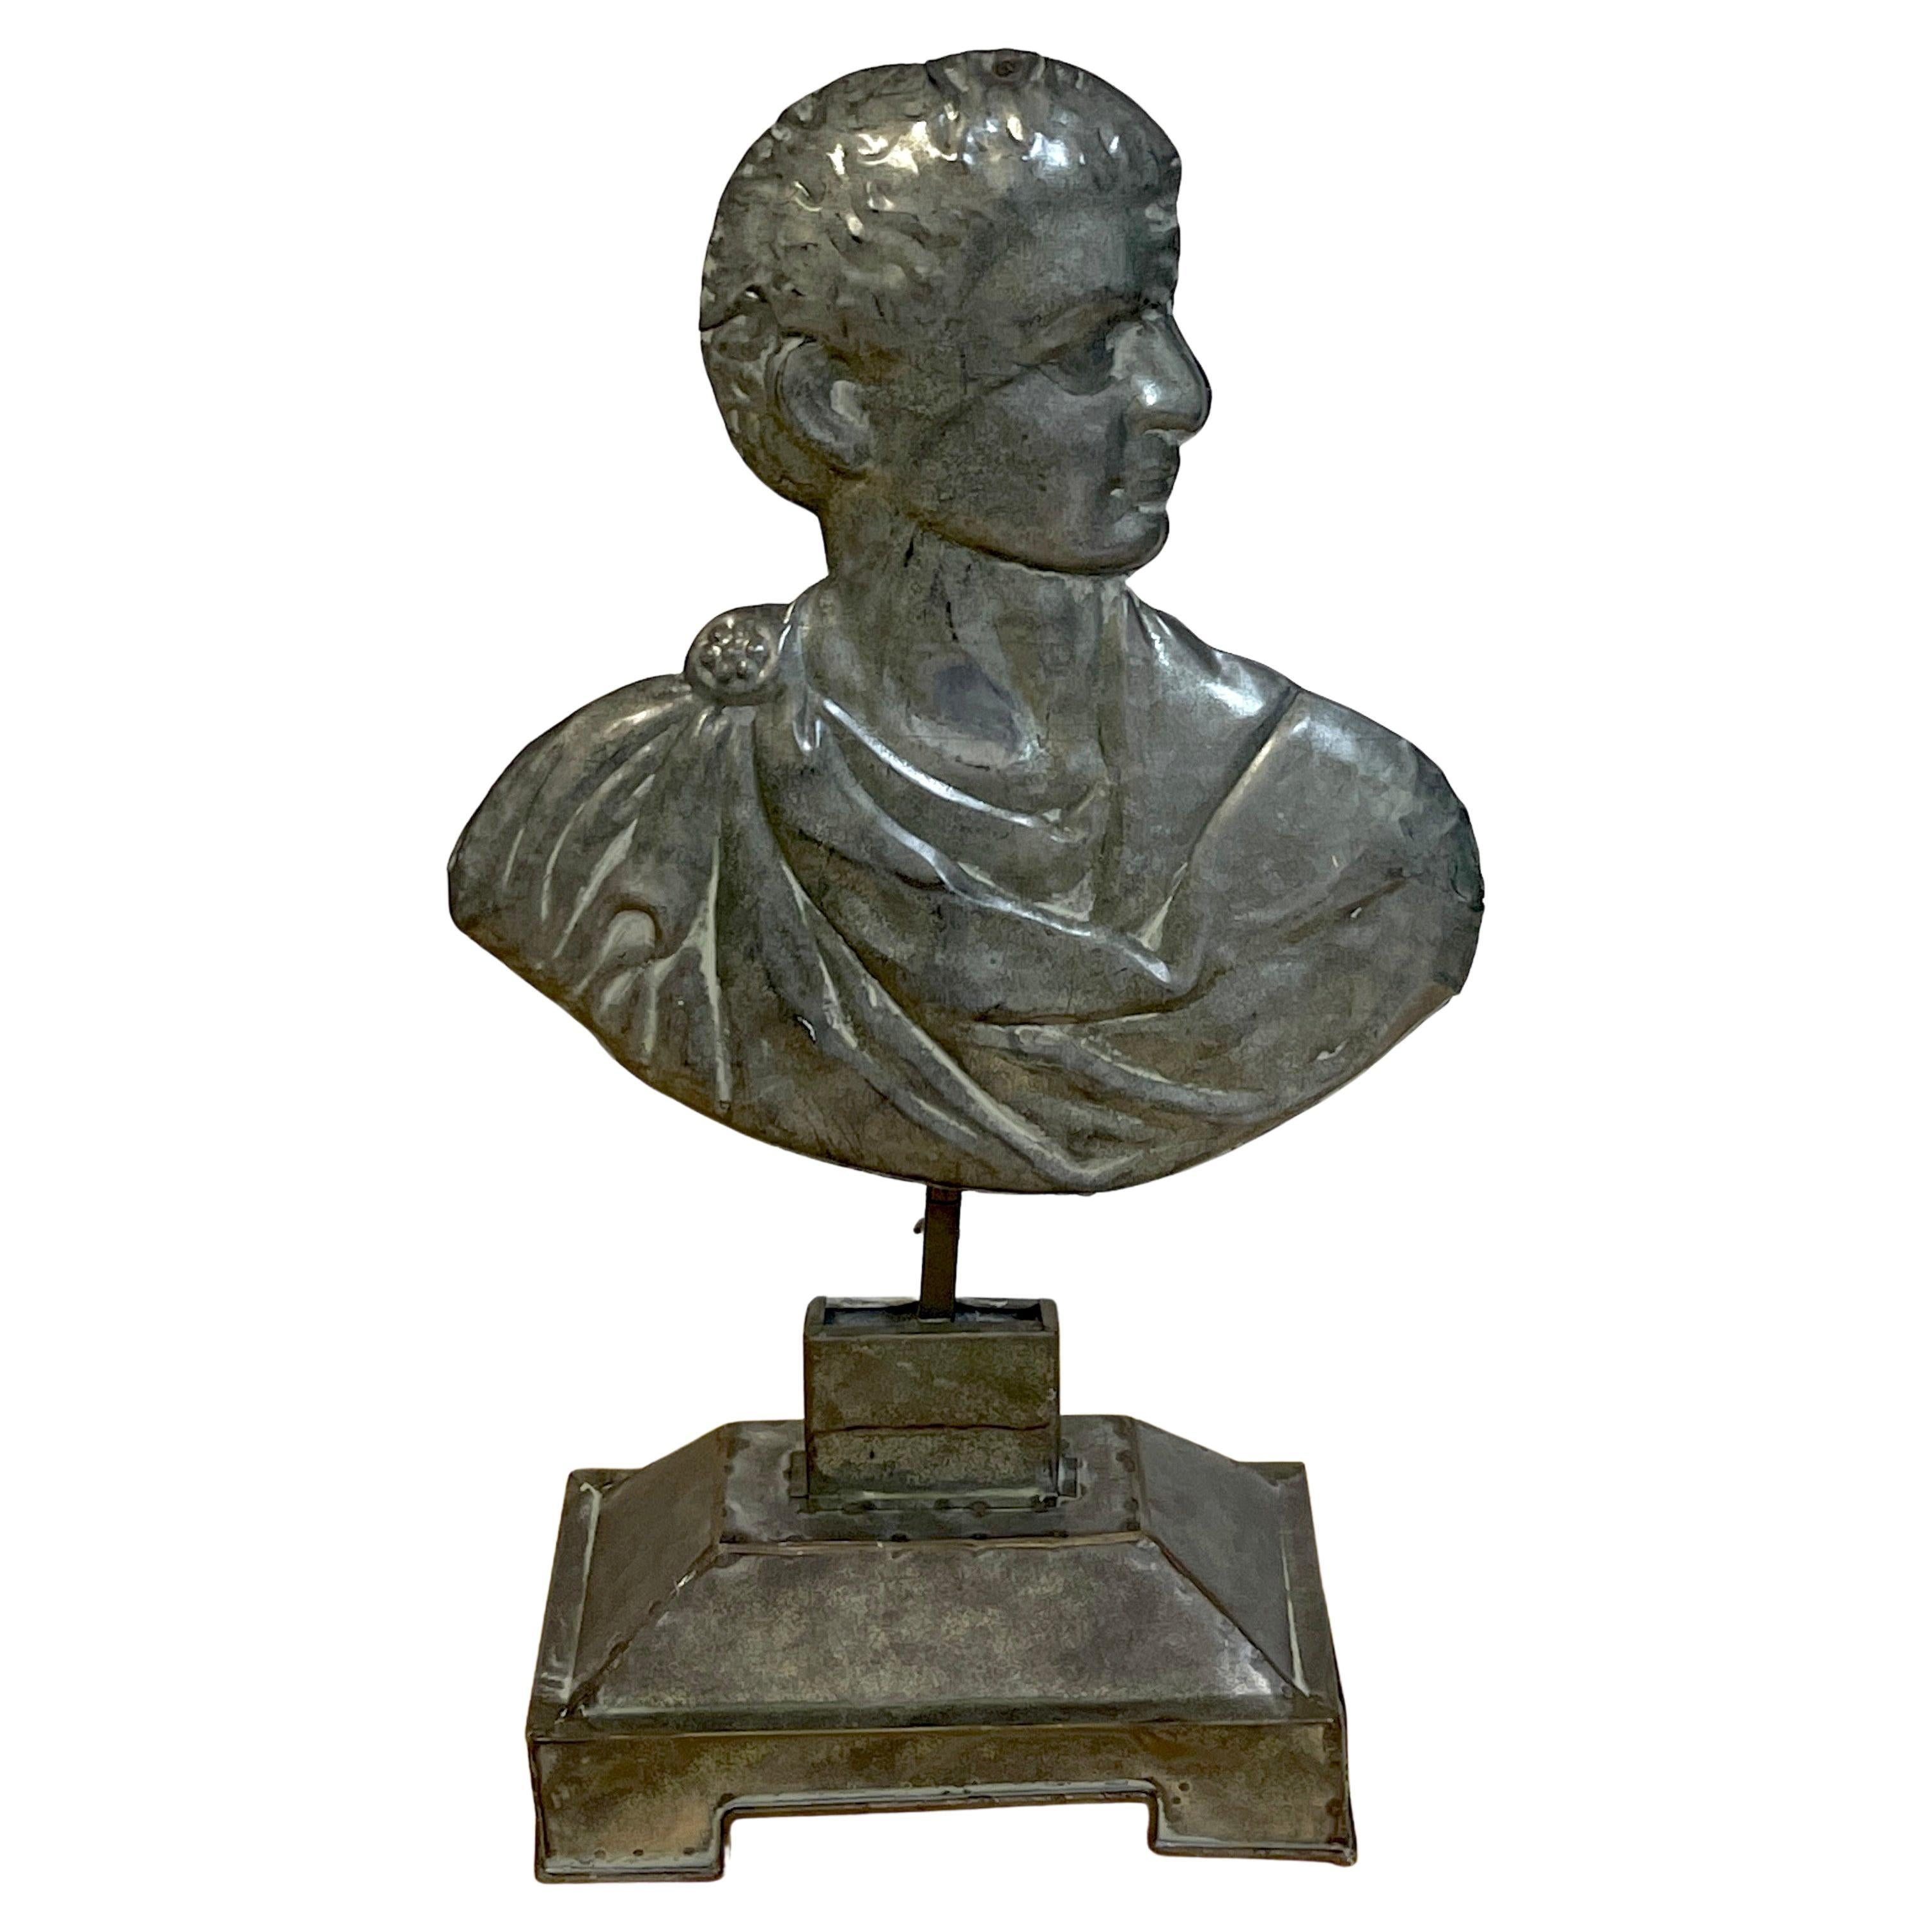 19th C Grand Tour Italian Tole Portrait Bust of a Roman Emperor